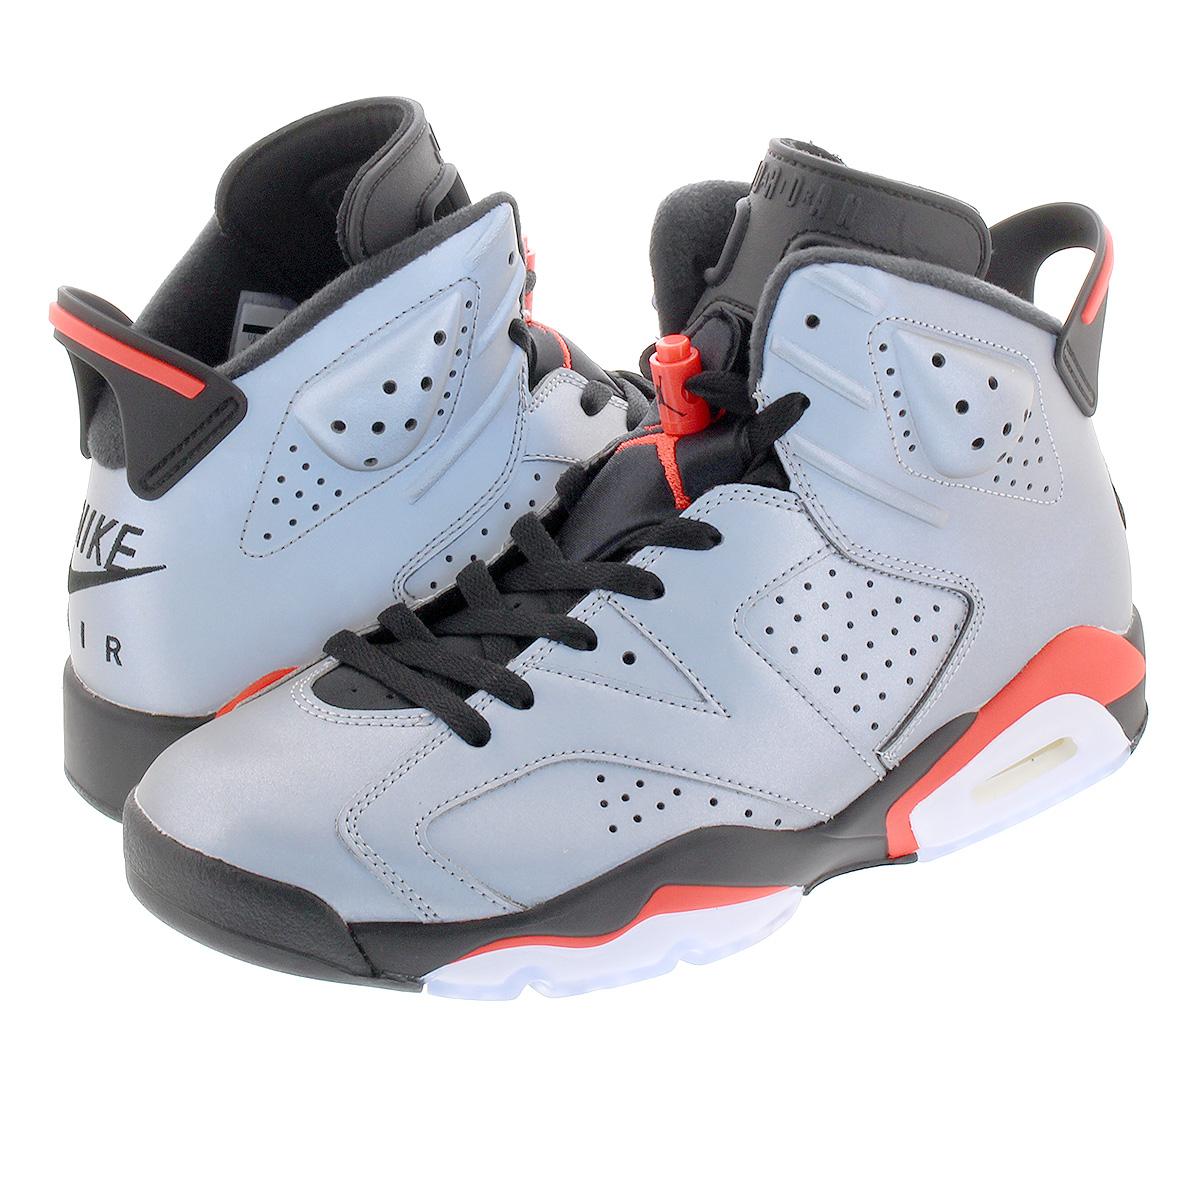 d1fa2cad78e NIKE AIR JORDAN 6 RETRO SP Nike Air Jordan 6 nostalgic SP REFLECT  SILVER/INFRARED ...